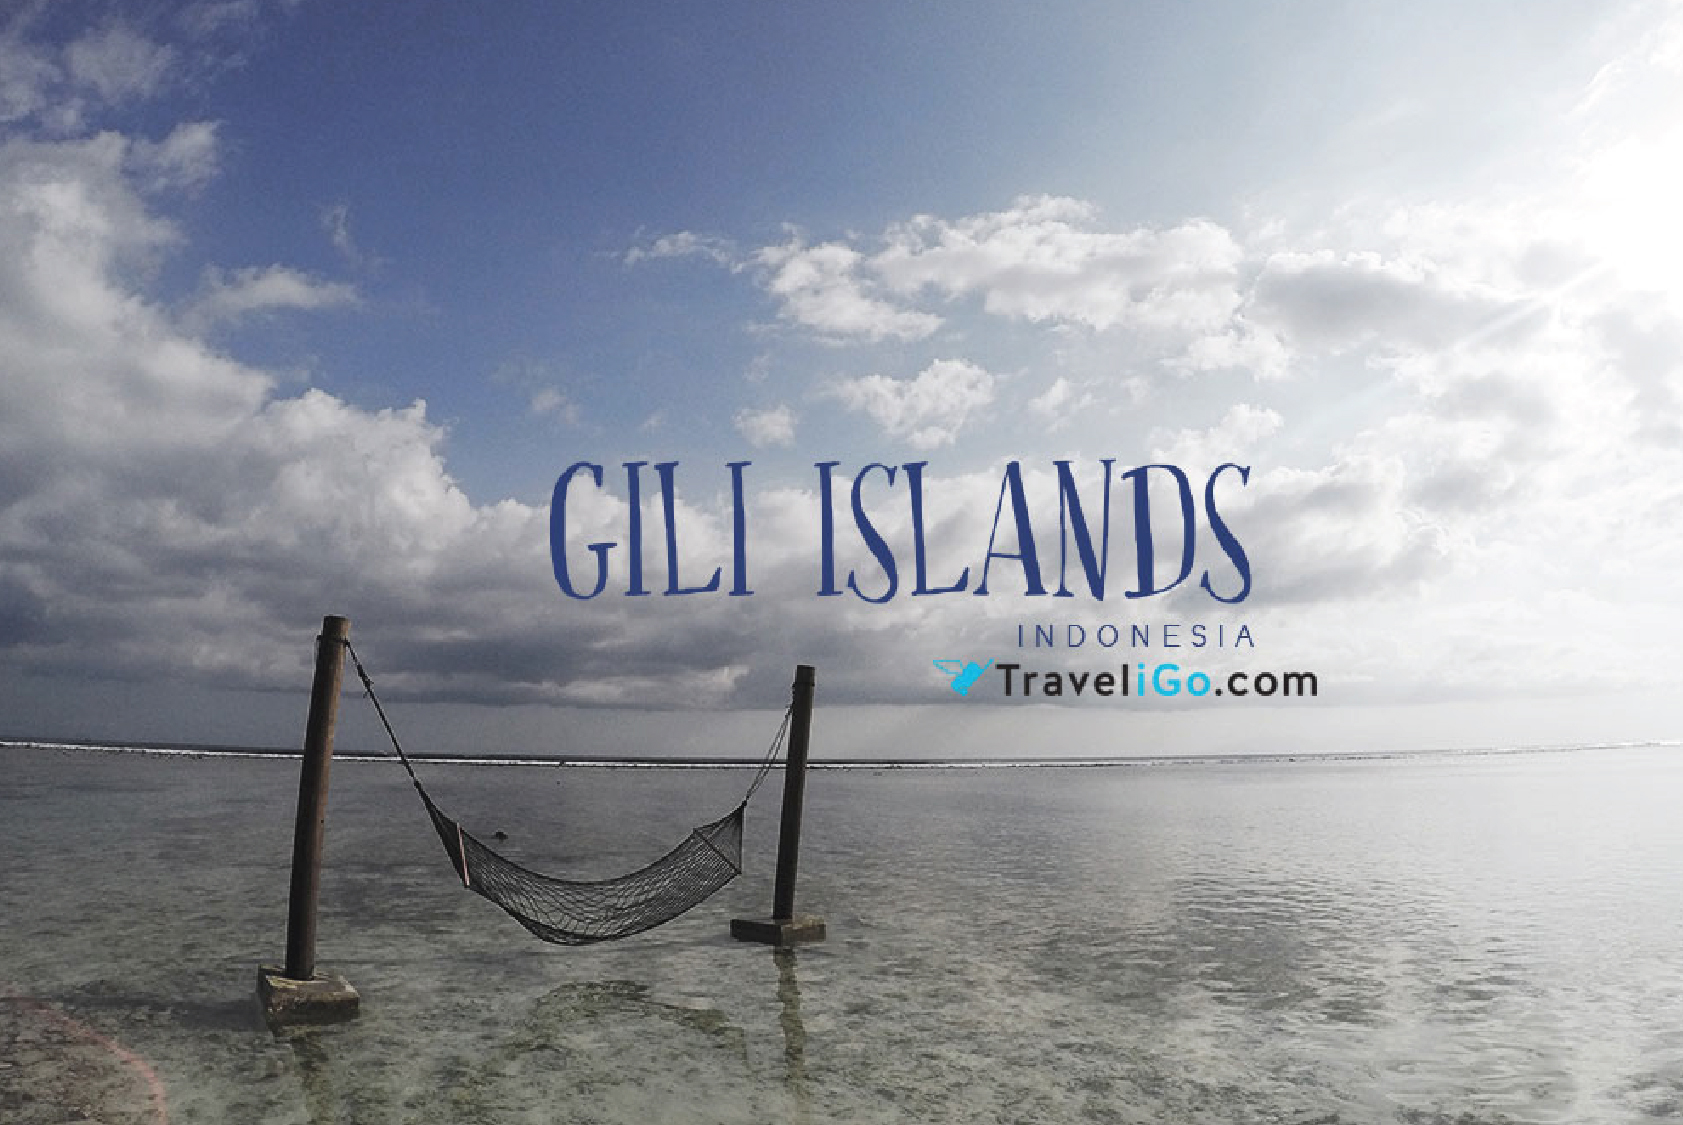 TraveliGo with HIGH ON DREAMS at GILI-ISLANDS-บาหลี-กิลี-ทริปนี้-ไม่มีเธอ